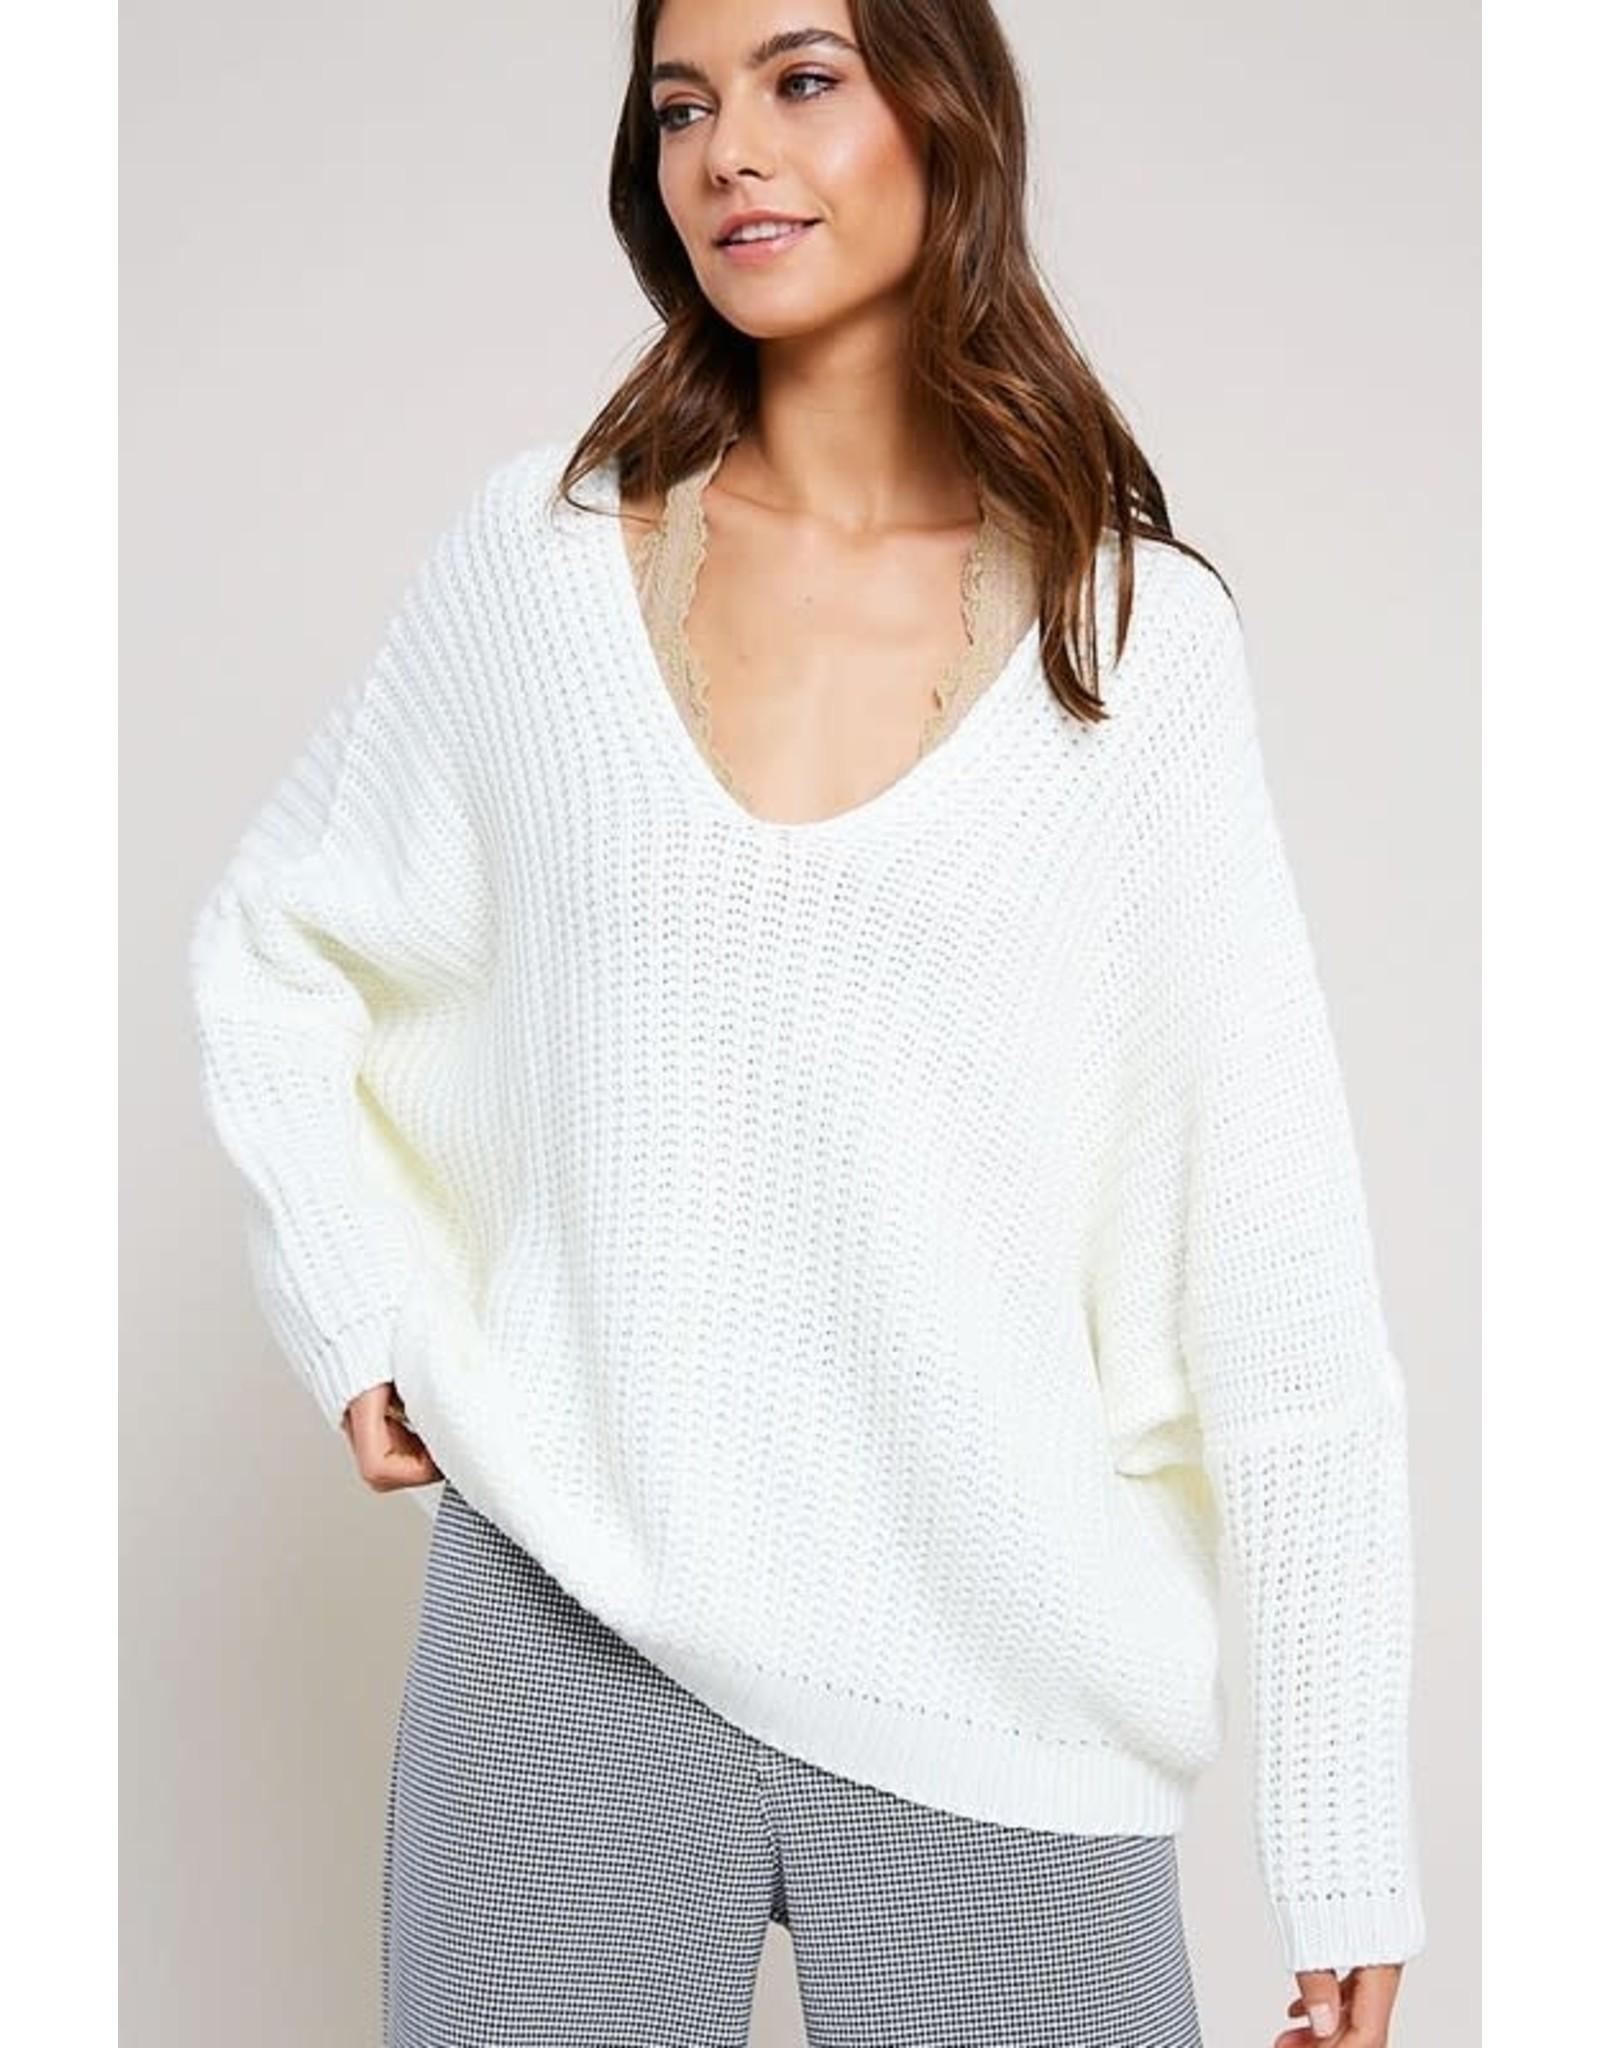 All Be Fine V-Neck Sweater